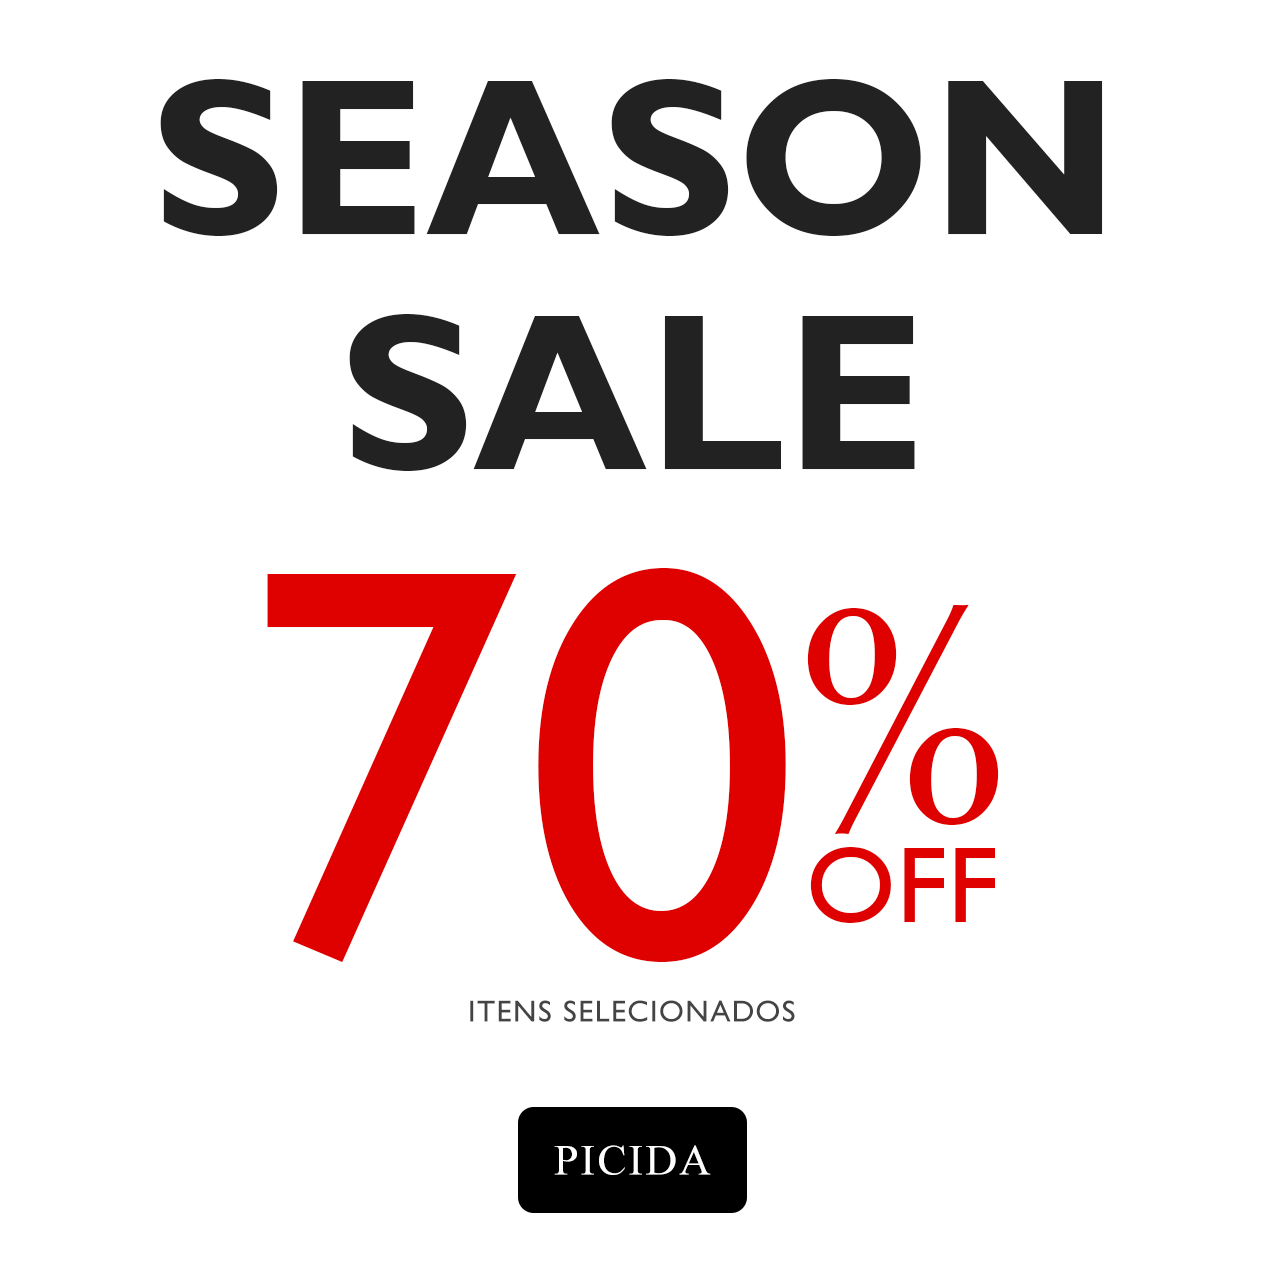 season-sale-70off